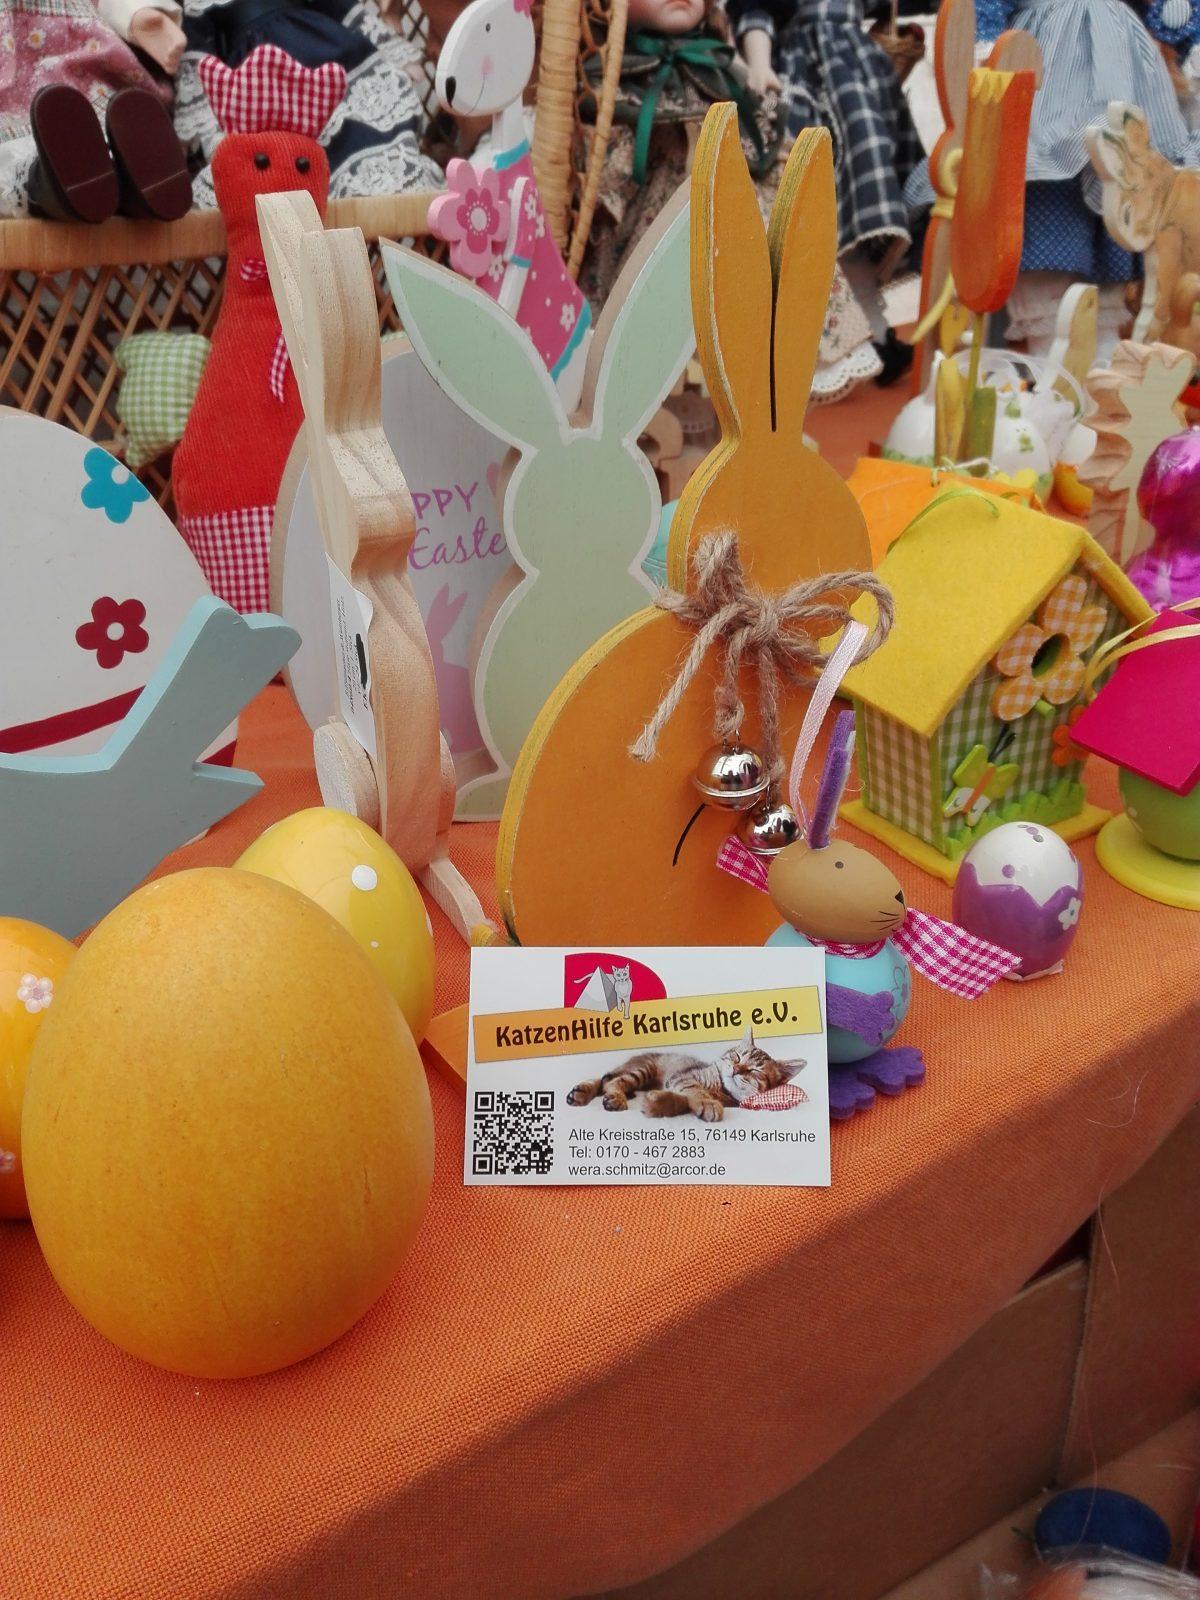 Osterdeko beim Frühlingsmarkt der KatzenHilfe Karlsruhe   chilibluetendotcom